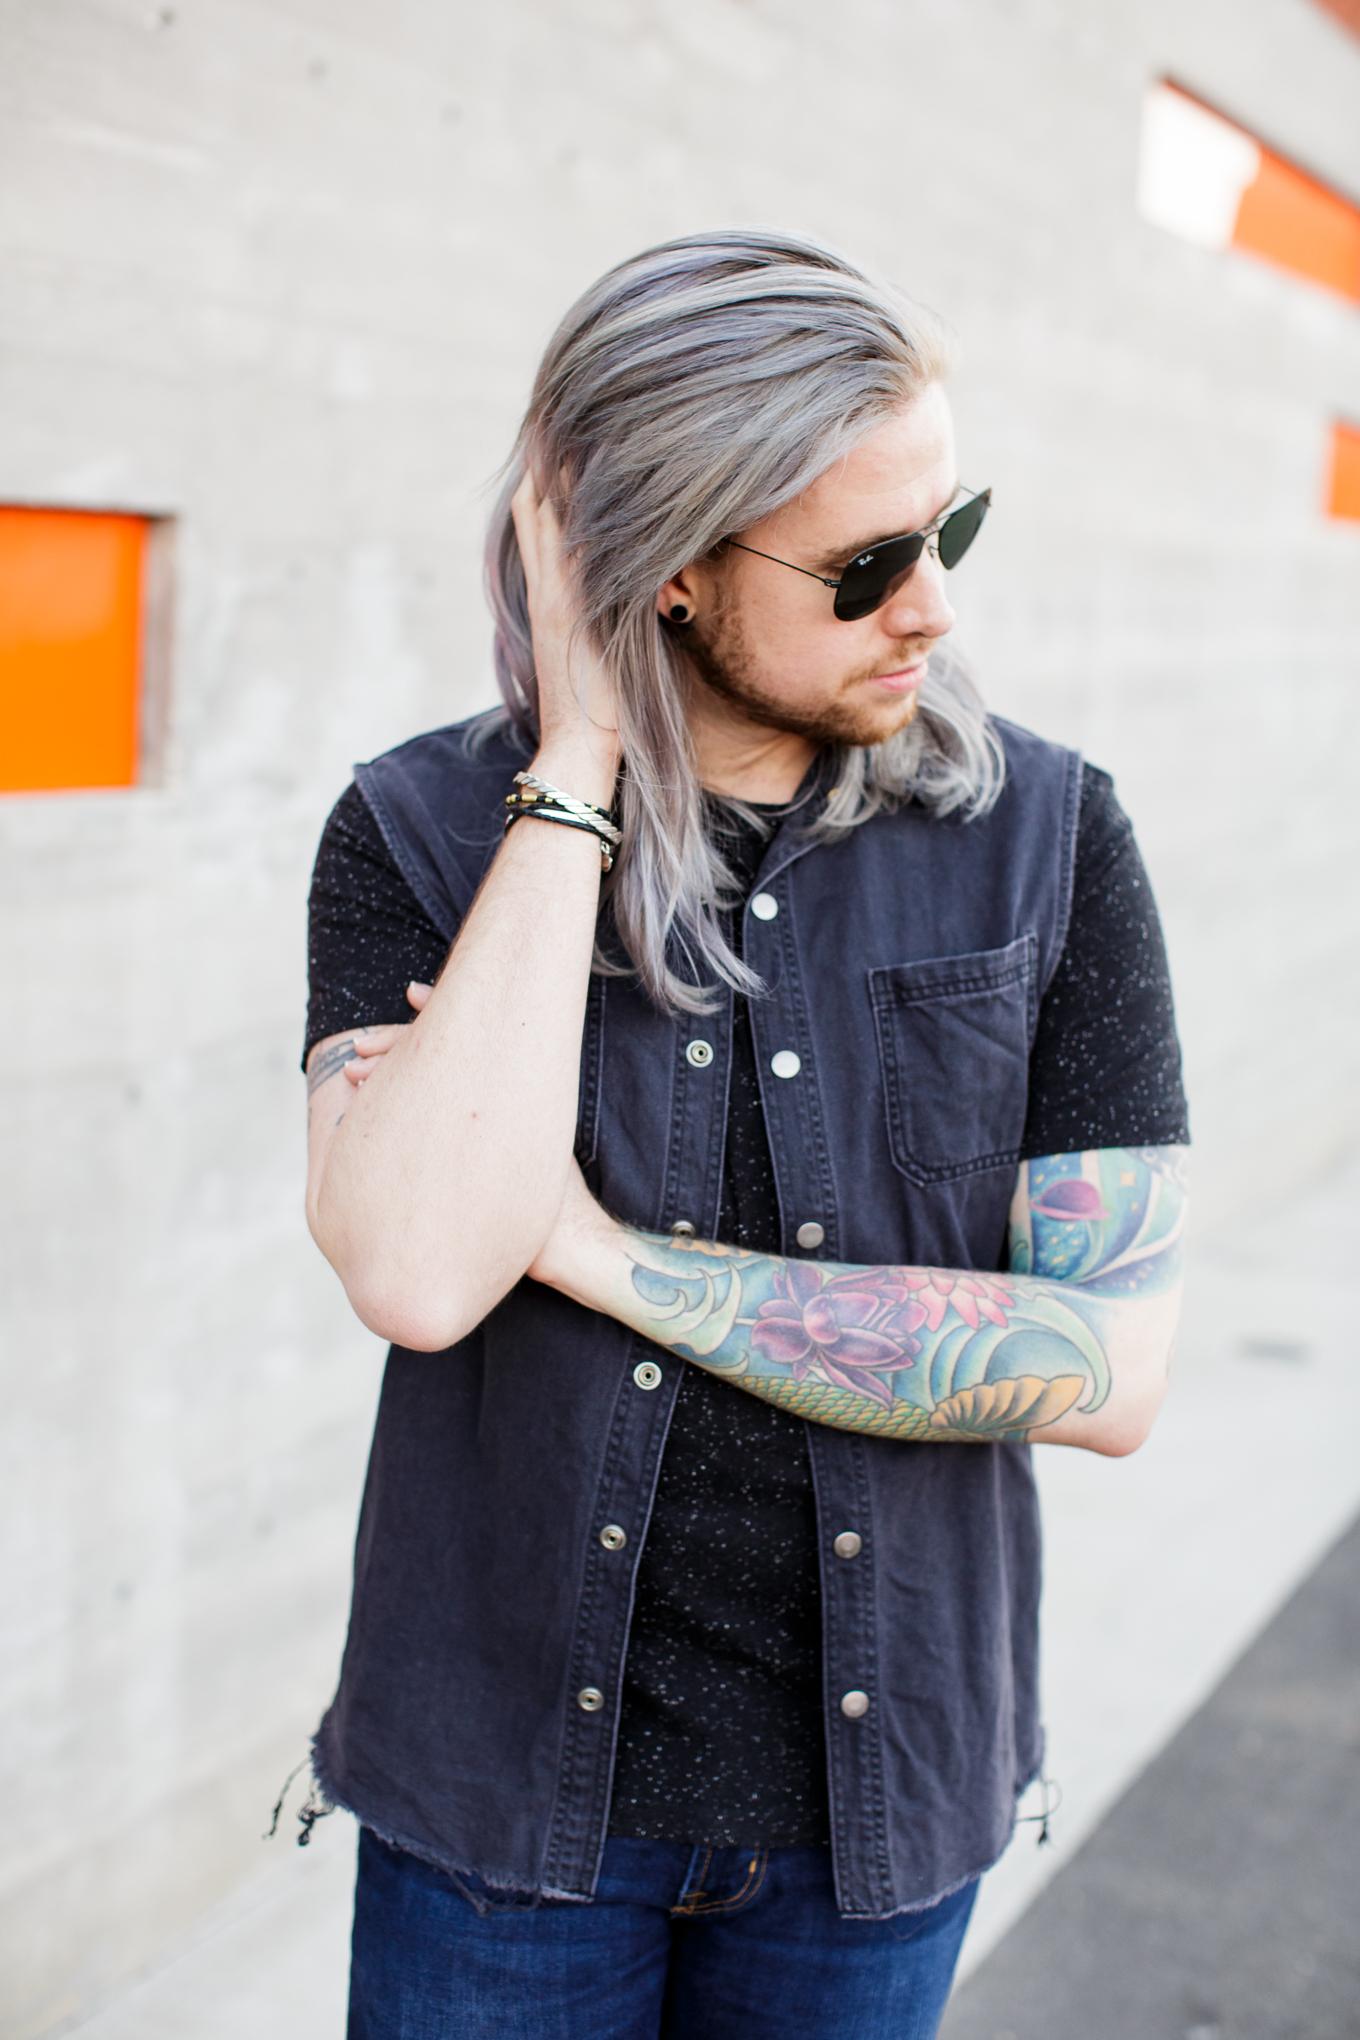 mens fashion blog, rayban aviators, big star denim, top man clothing, wolverine boots